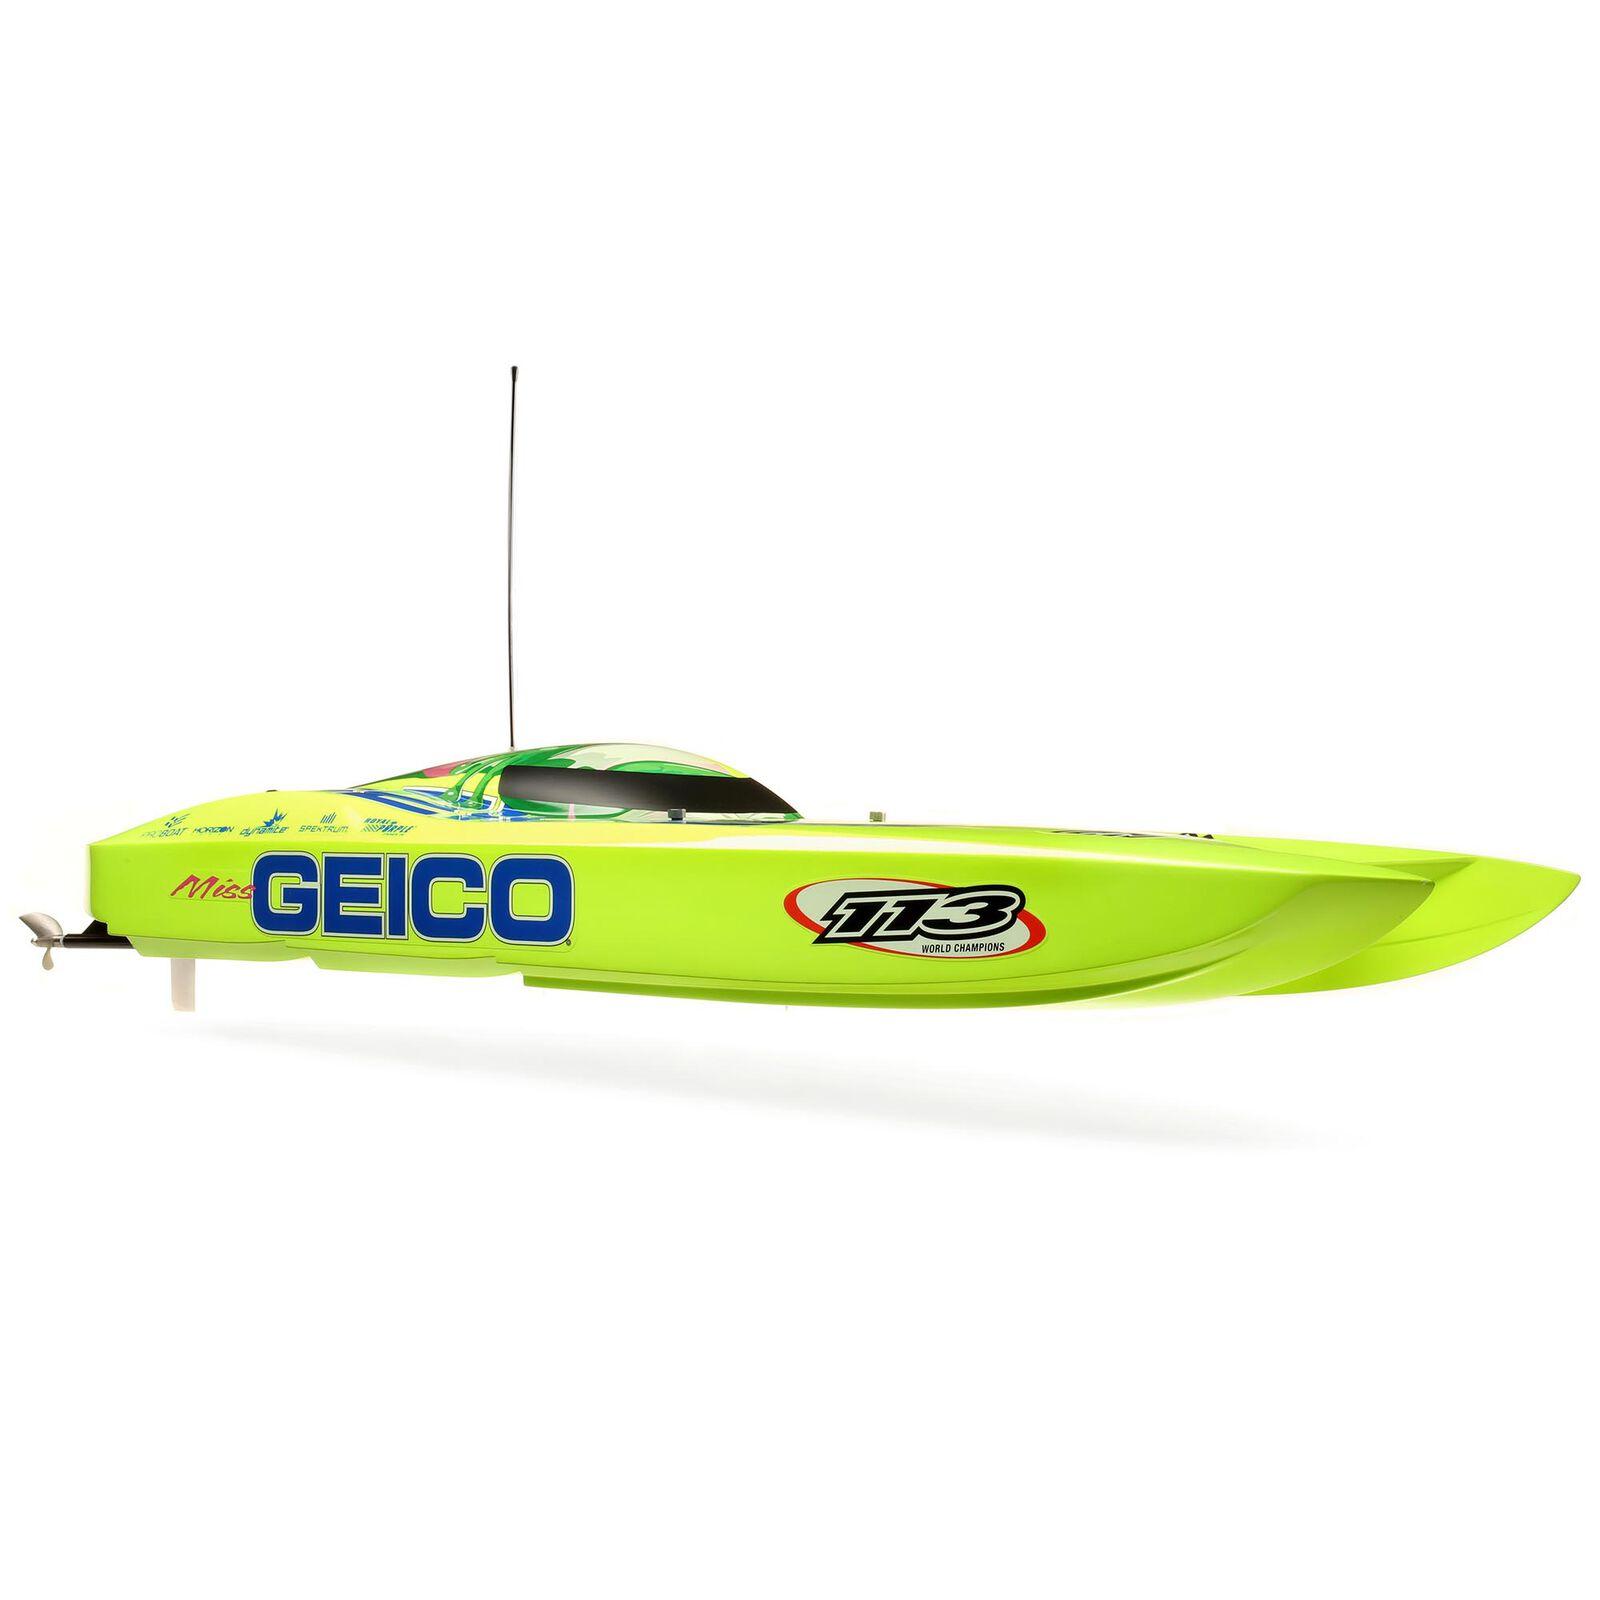 "Miss GEICO Zelos 36"" Twin Brushless Catamaran RTR"